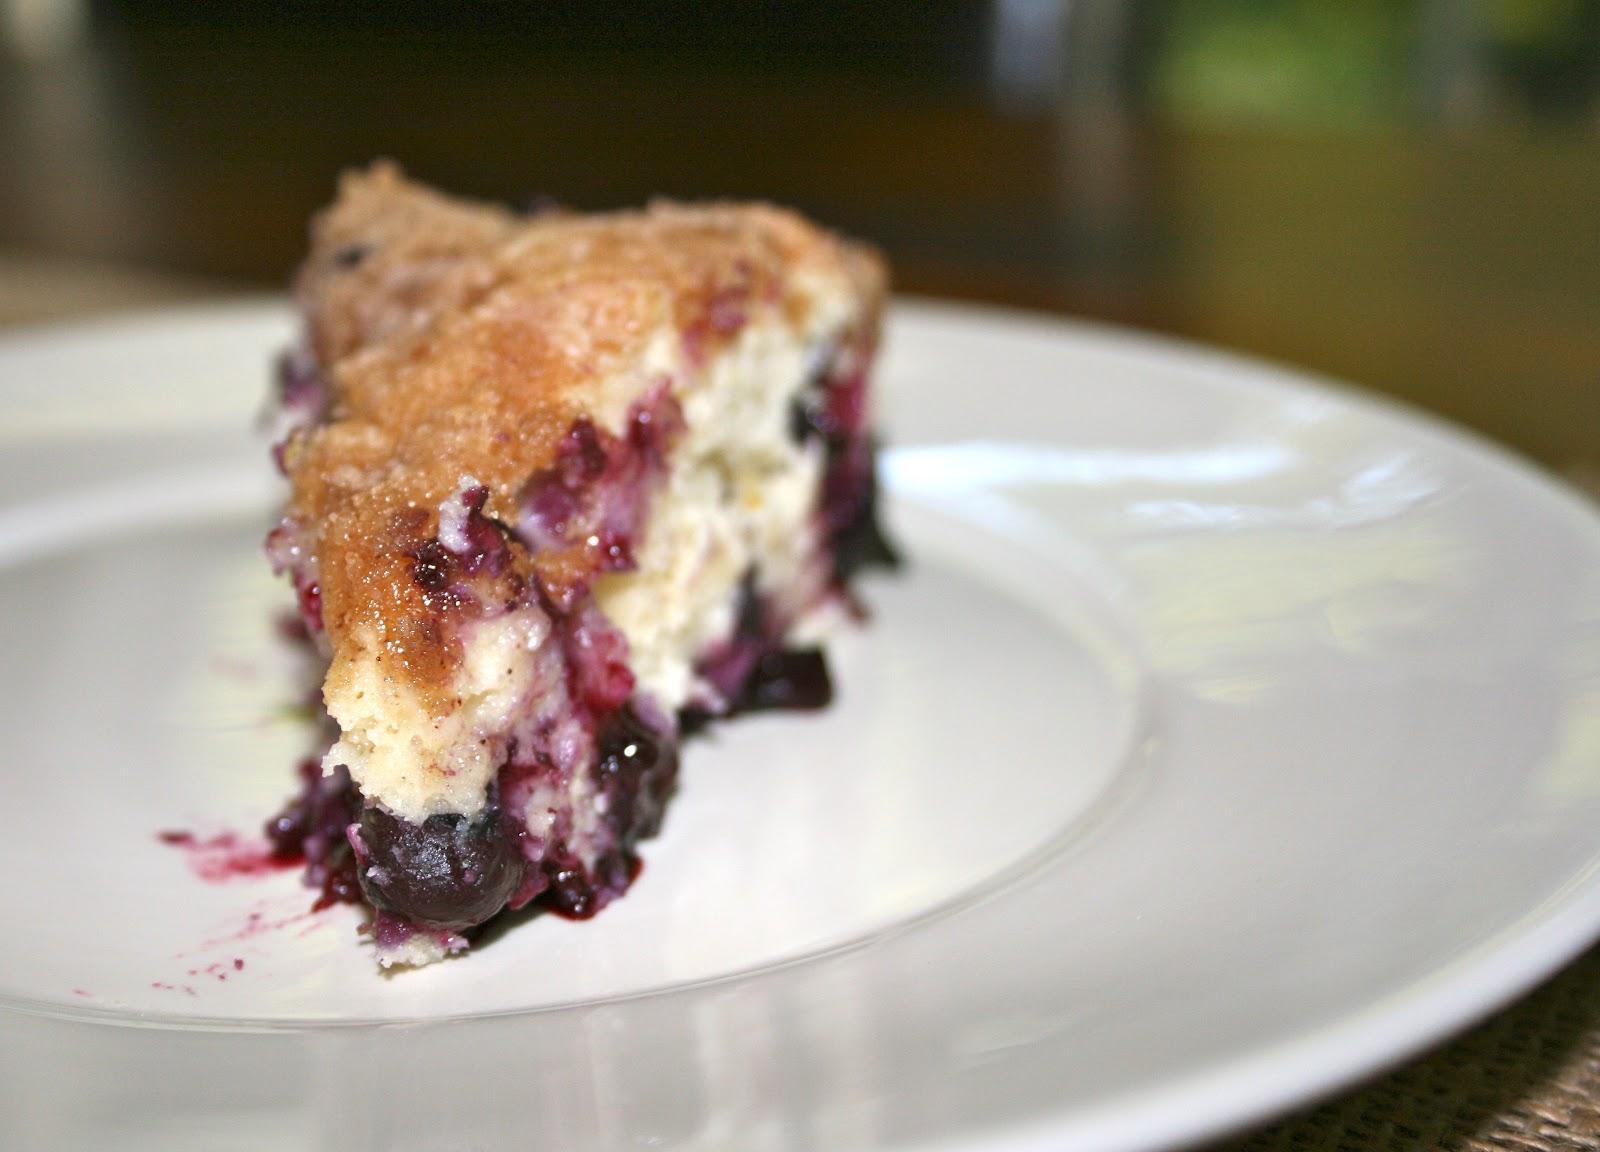 Wren's Rambles: Blueberry Buttermilk Crumb Cake